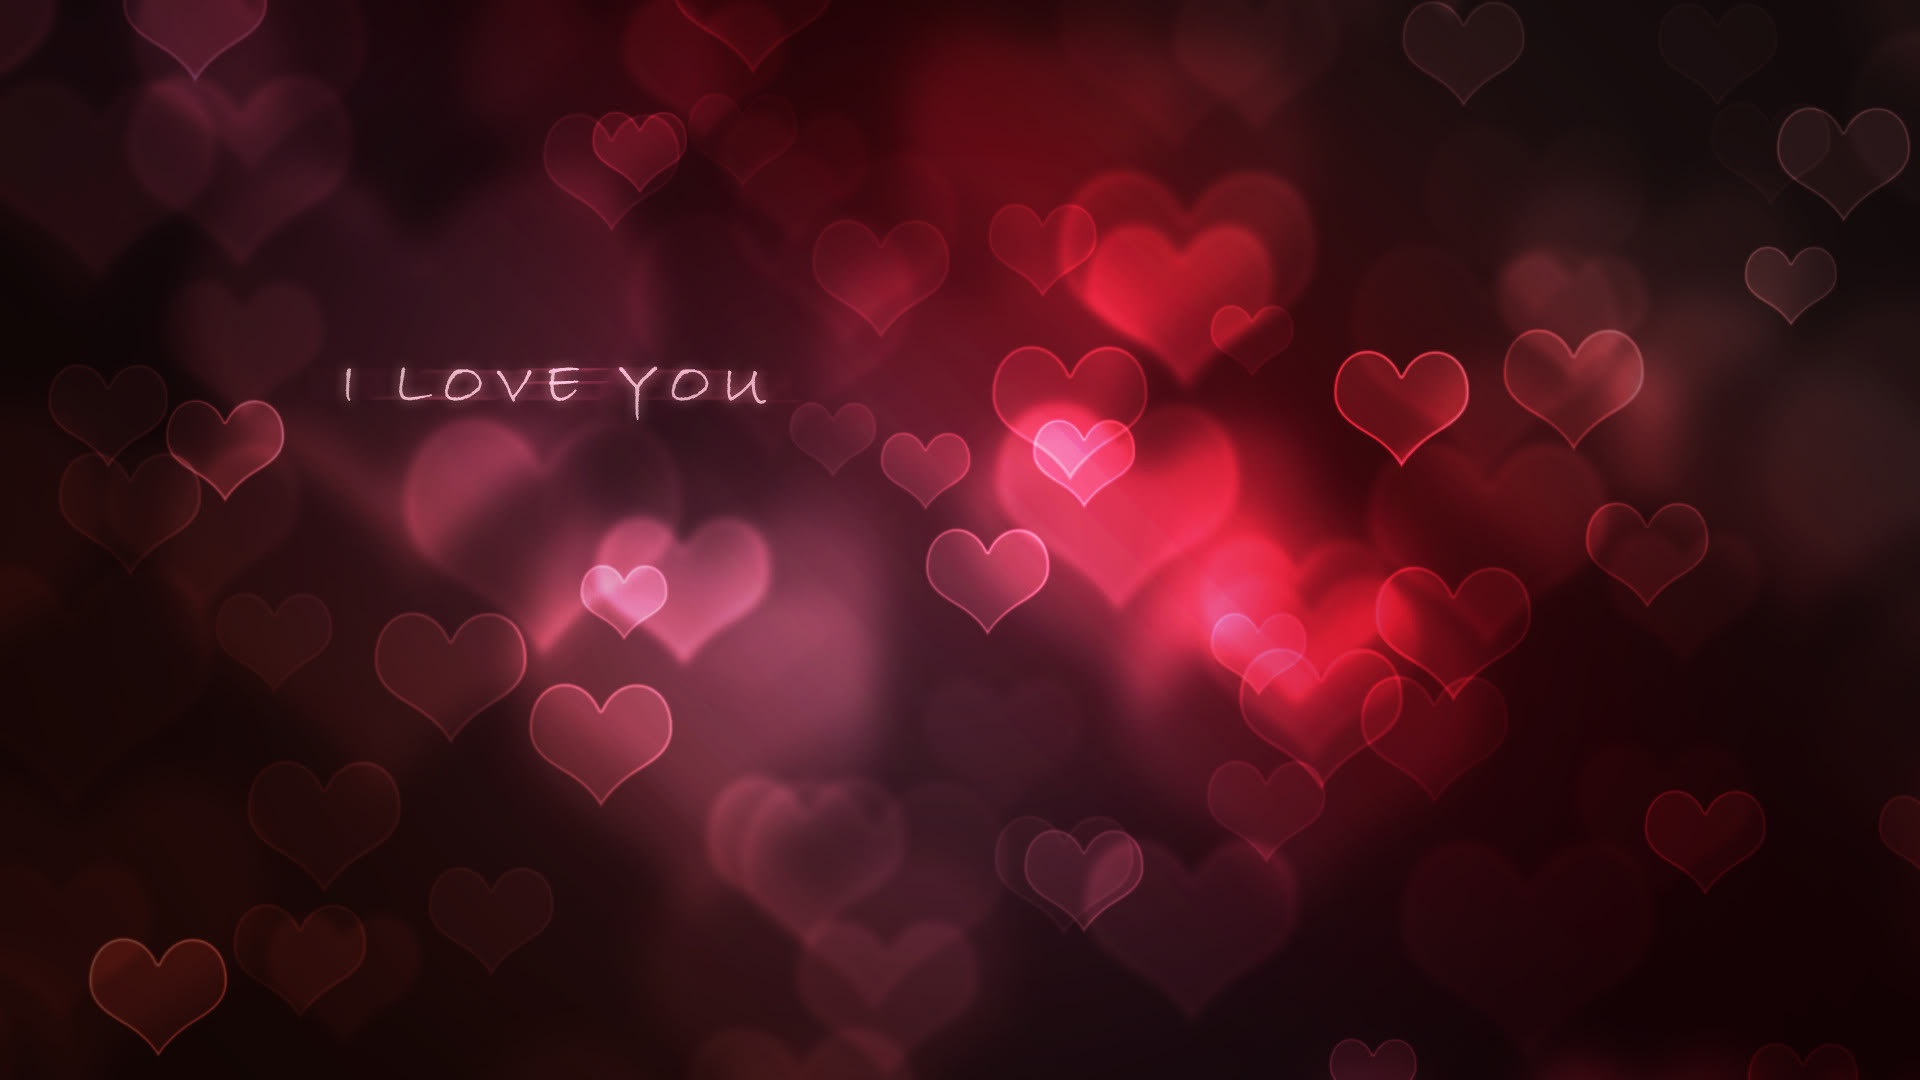 Lovely Wallpaper Girl And Boy I Love You Background Free Download Pixelstalk Net